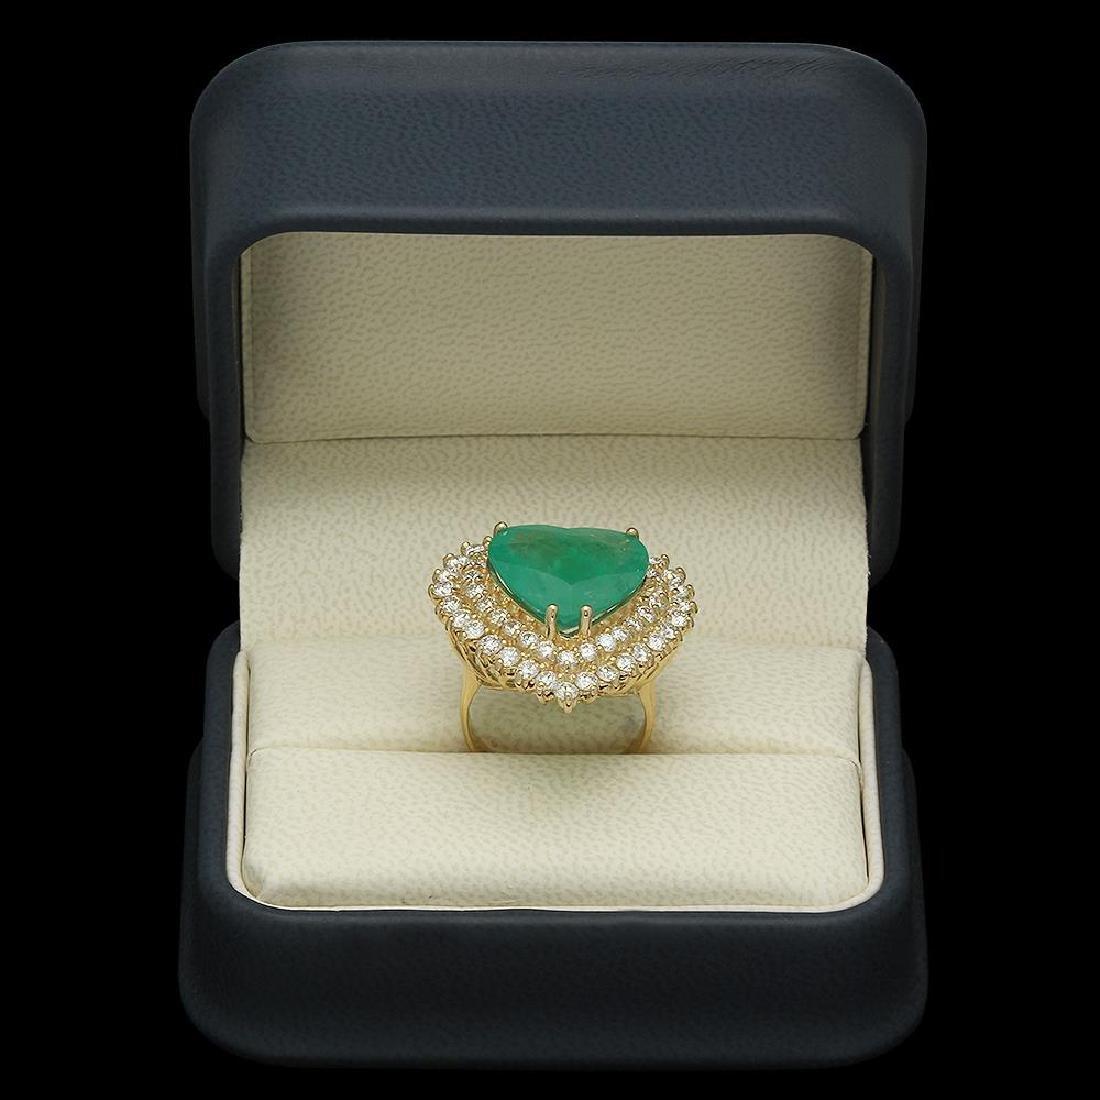 14K Gold 11.09ct Emerald 2.83ct Diamond Ring - 4